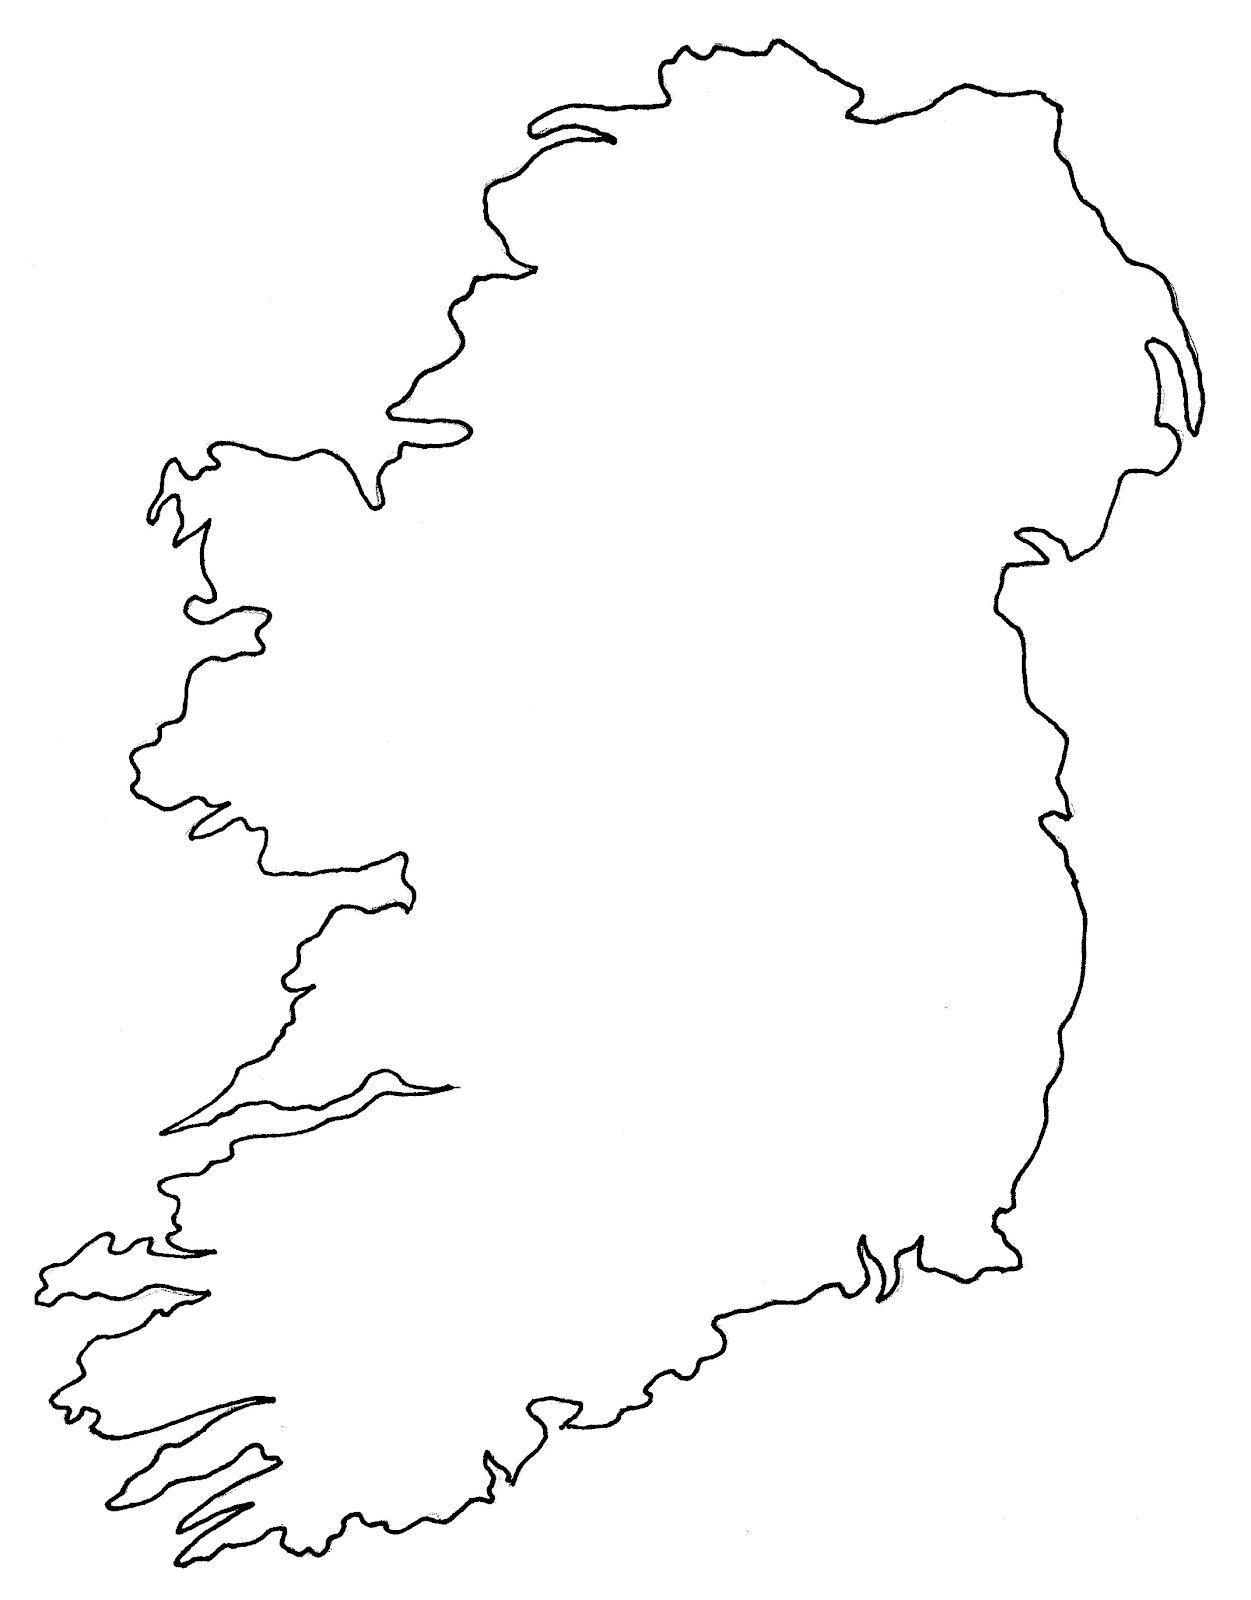 Slepa Mapa Irsko Prazdna Mapa Irska Severni Evropa Evropa